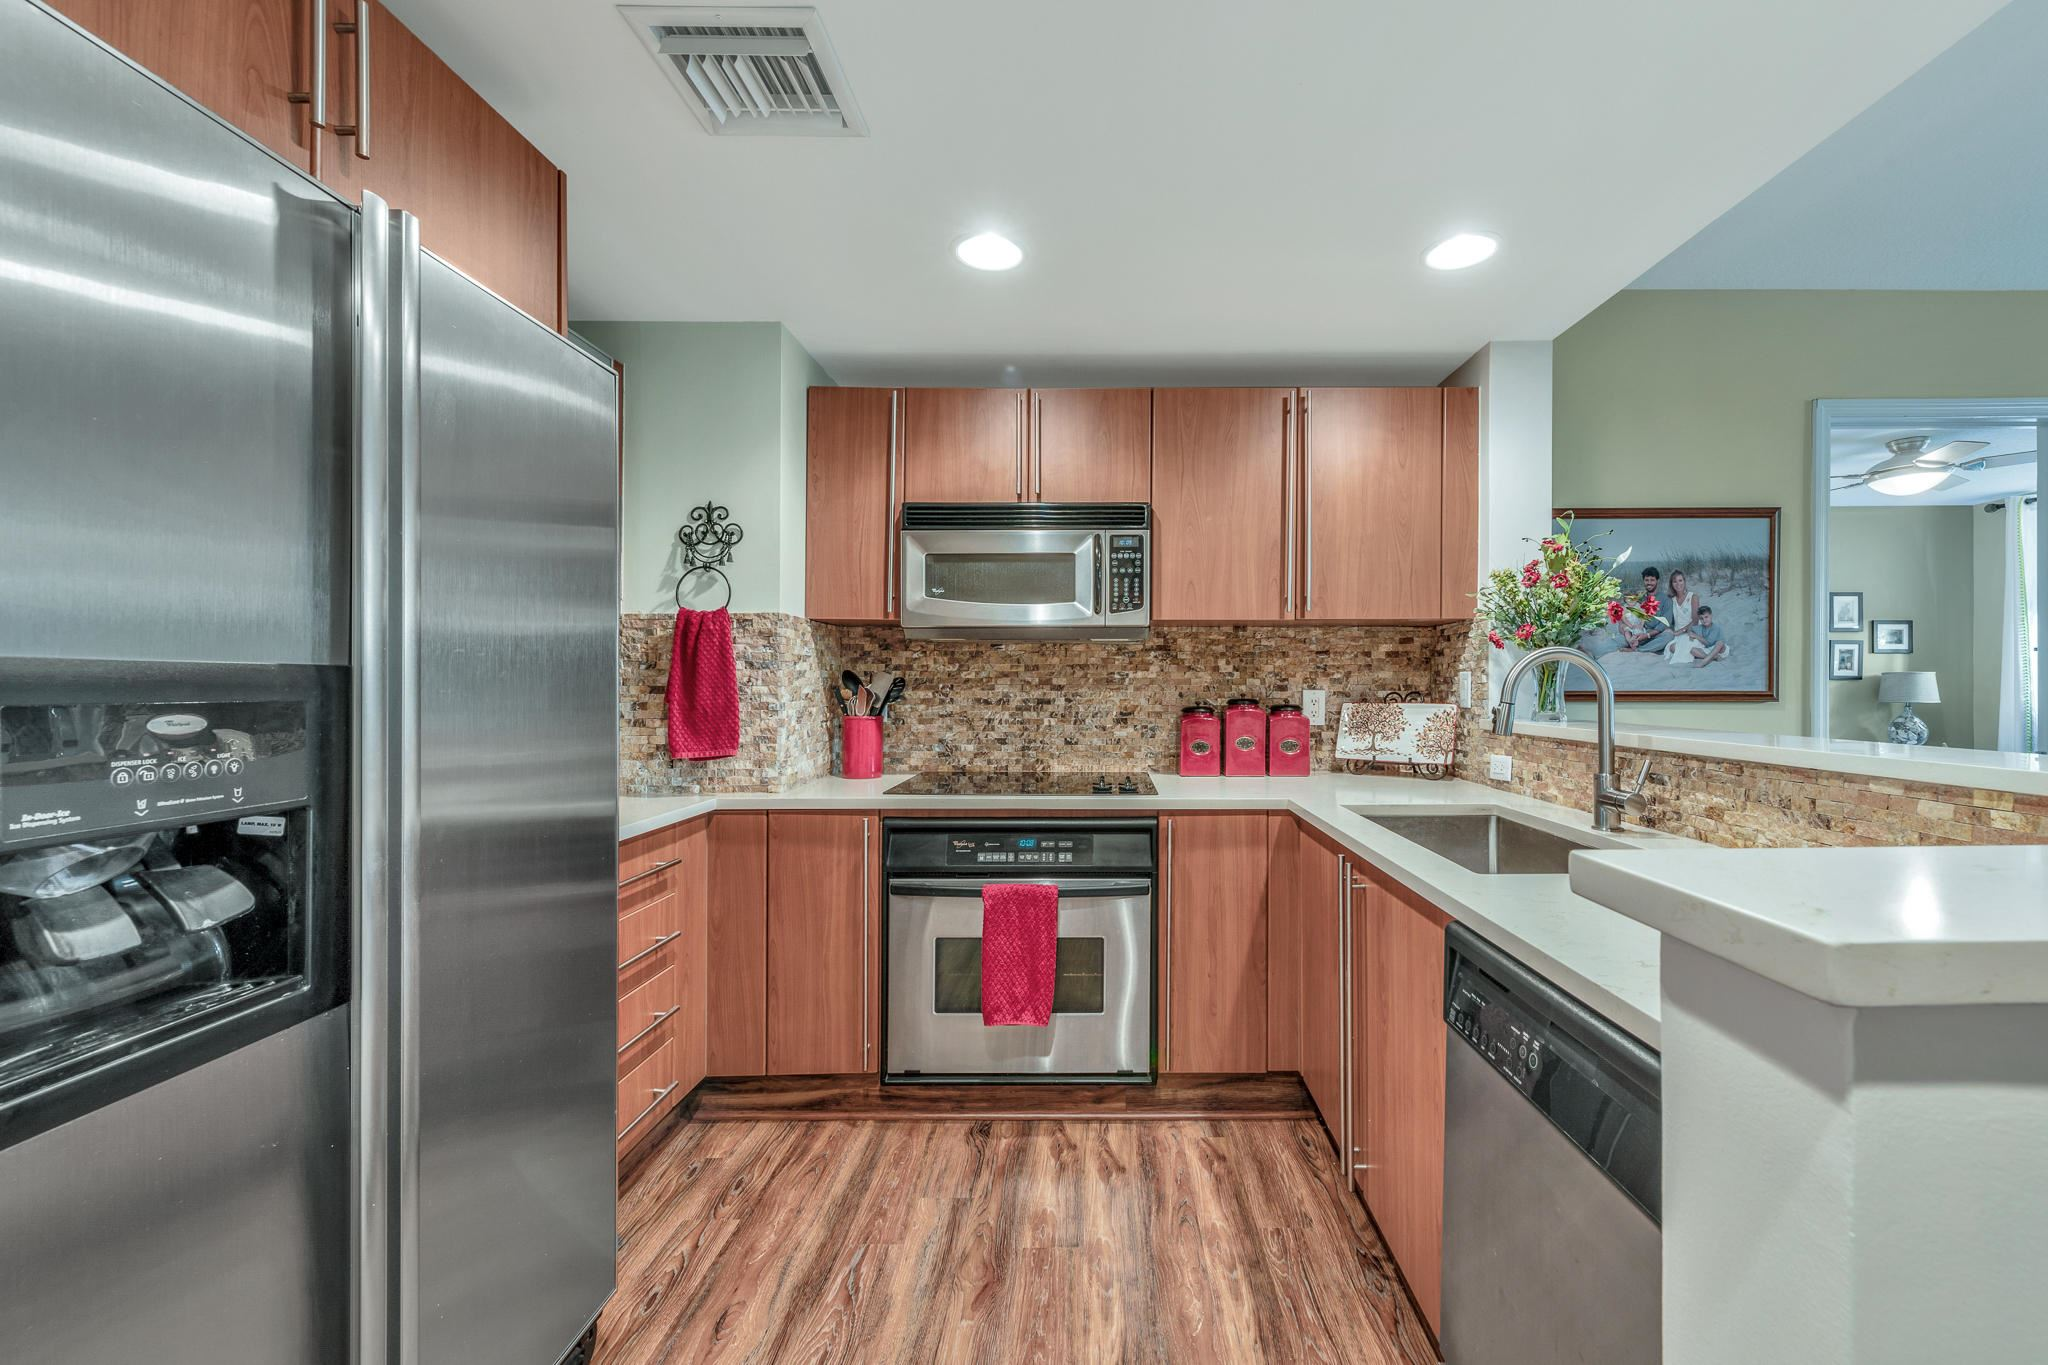 610 Clematis Street Unit 215 West Palm Beach, FL 33401